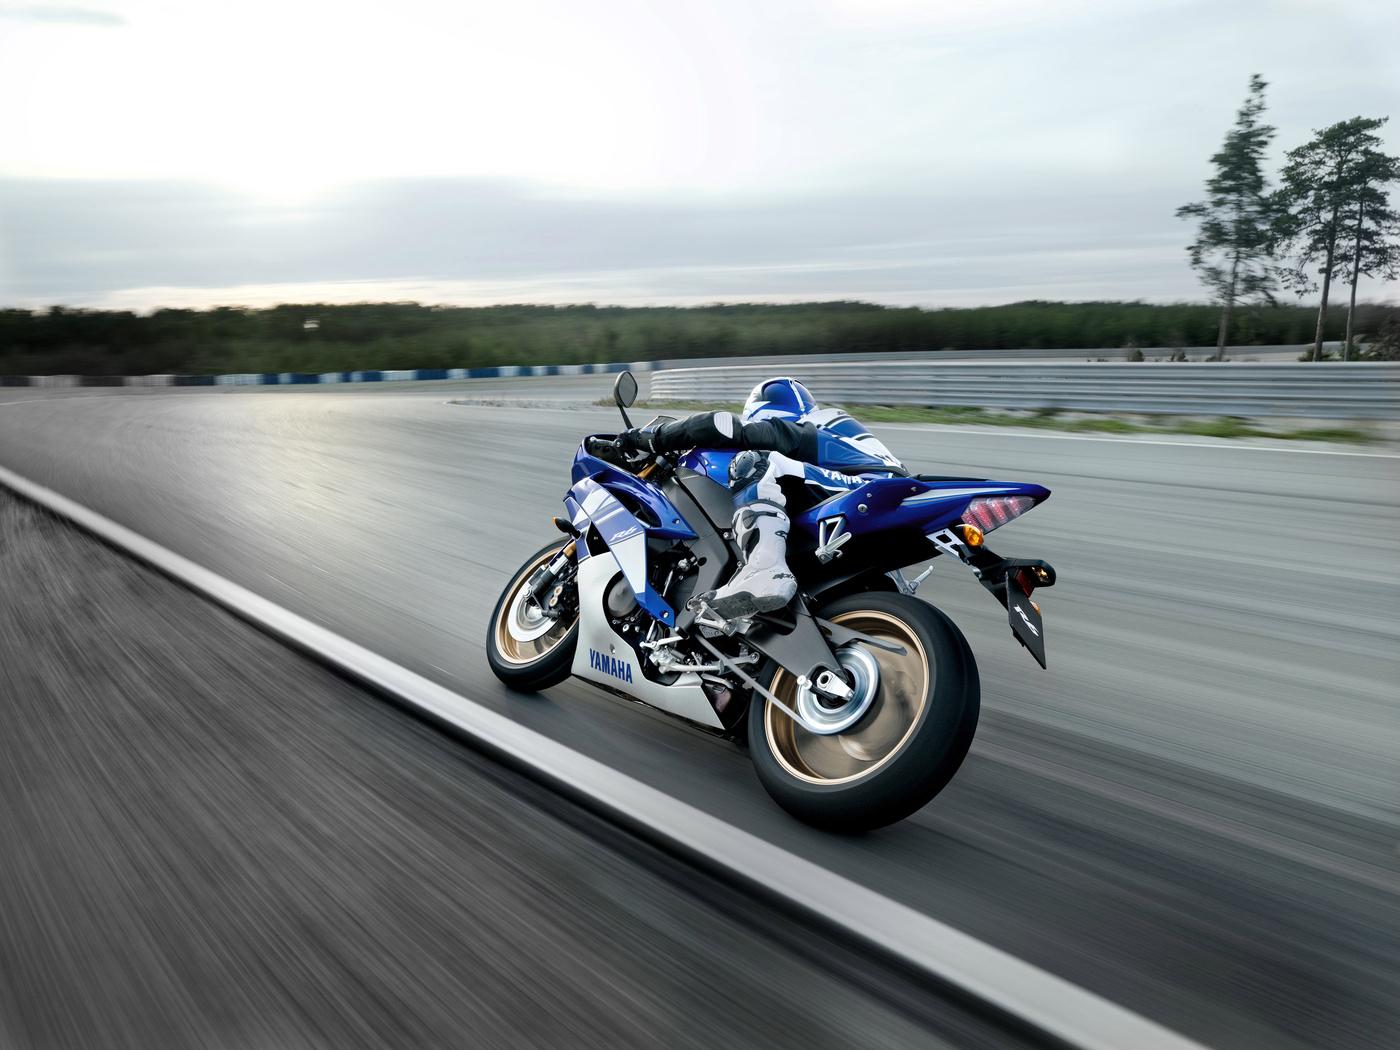 yamaha, yzf-r6, 2009, спортбайк, белый, синий, мотоцикл, мото, р6, пилот, шлем, дорога, скорость, 2011